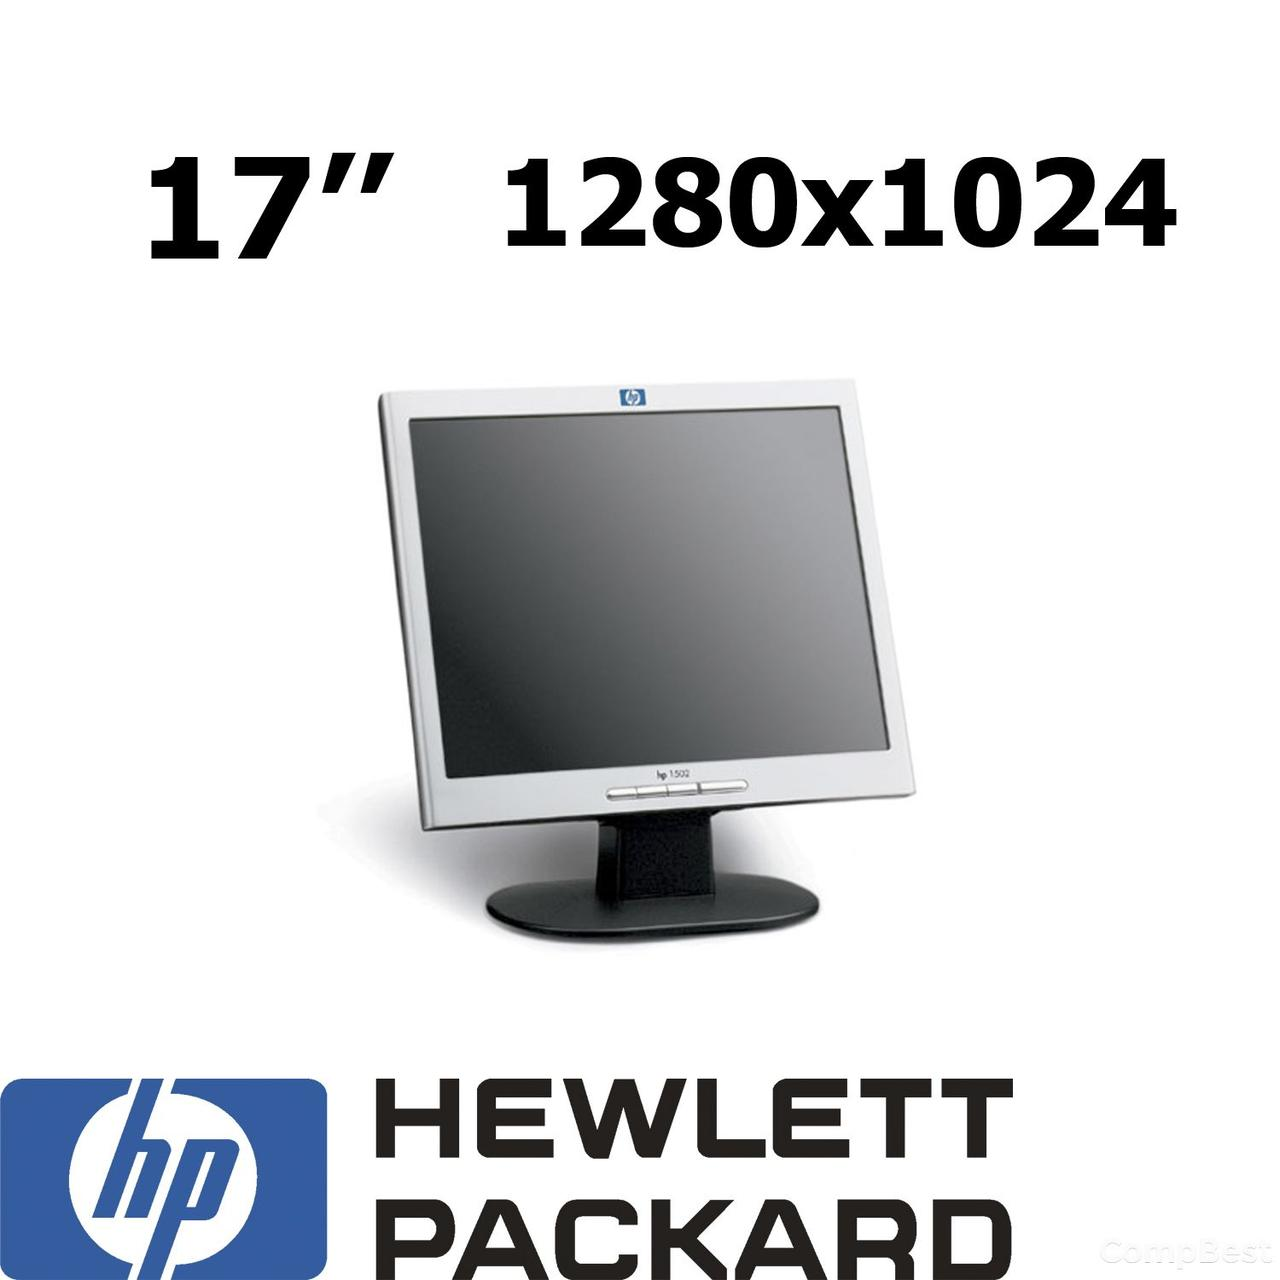 Монитор Hewlett-Packard L1702 / 17' / 1280x1024 / 5:4